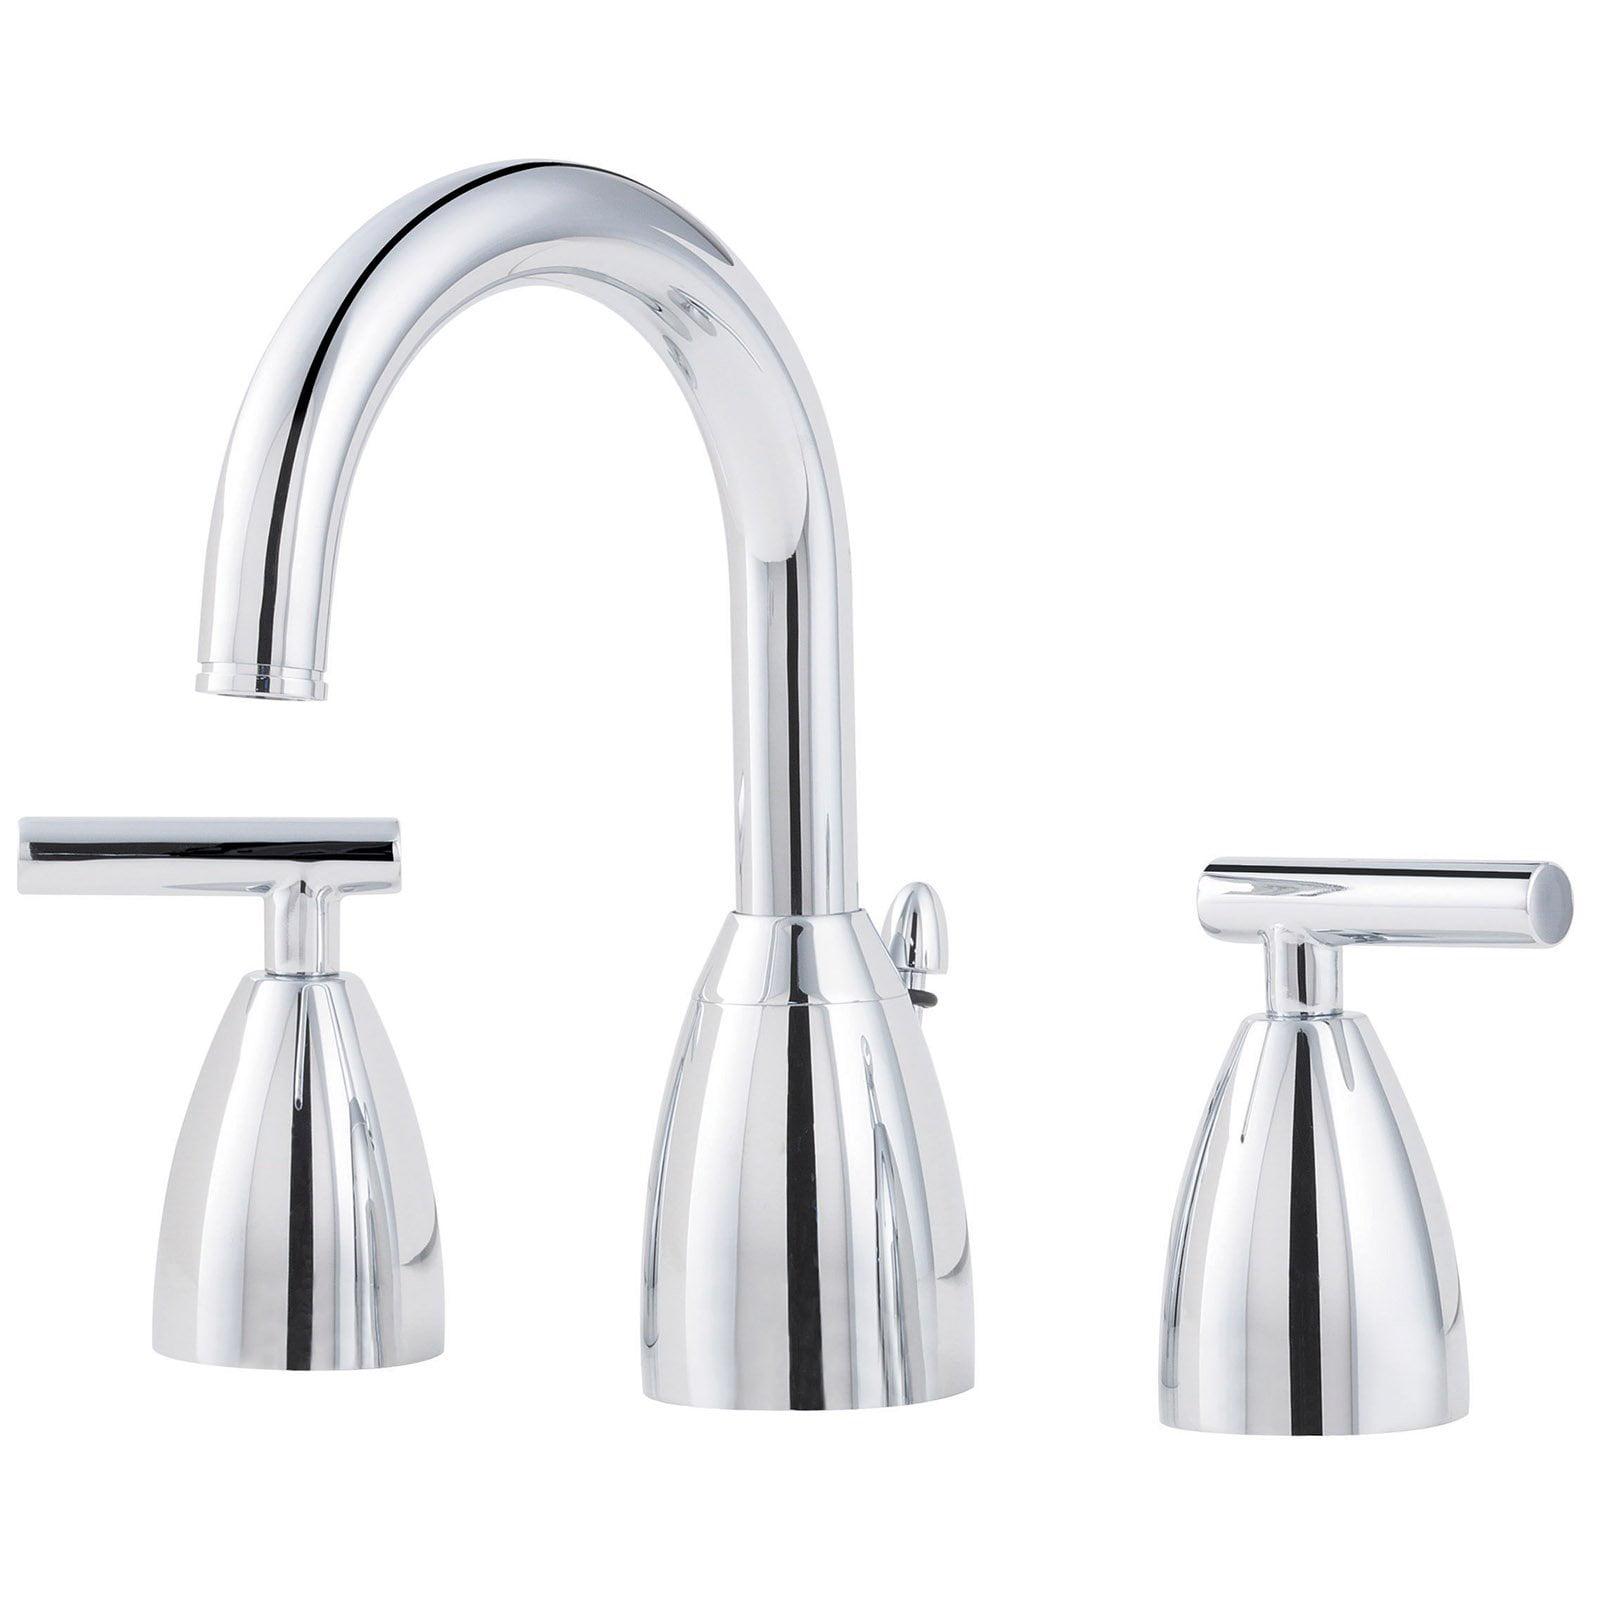 Pfister Contempra F-049-N Widespread Bathroom Faucet - Brushed Nickel